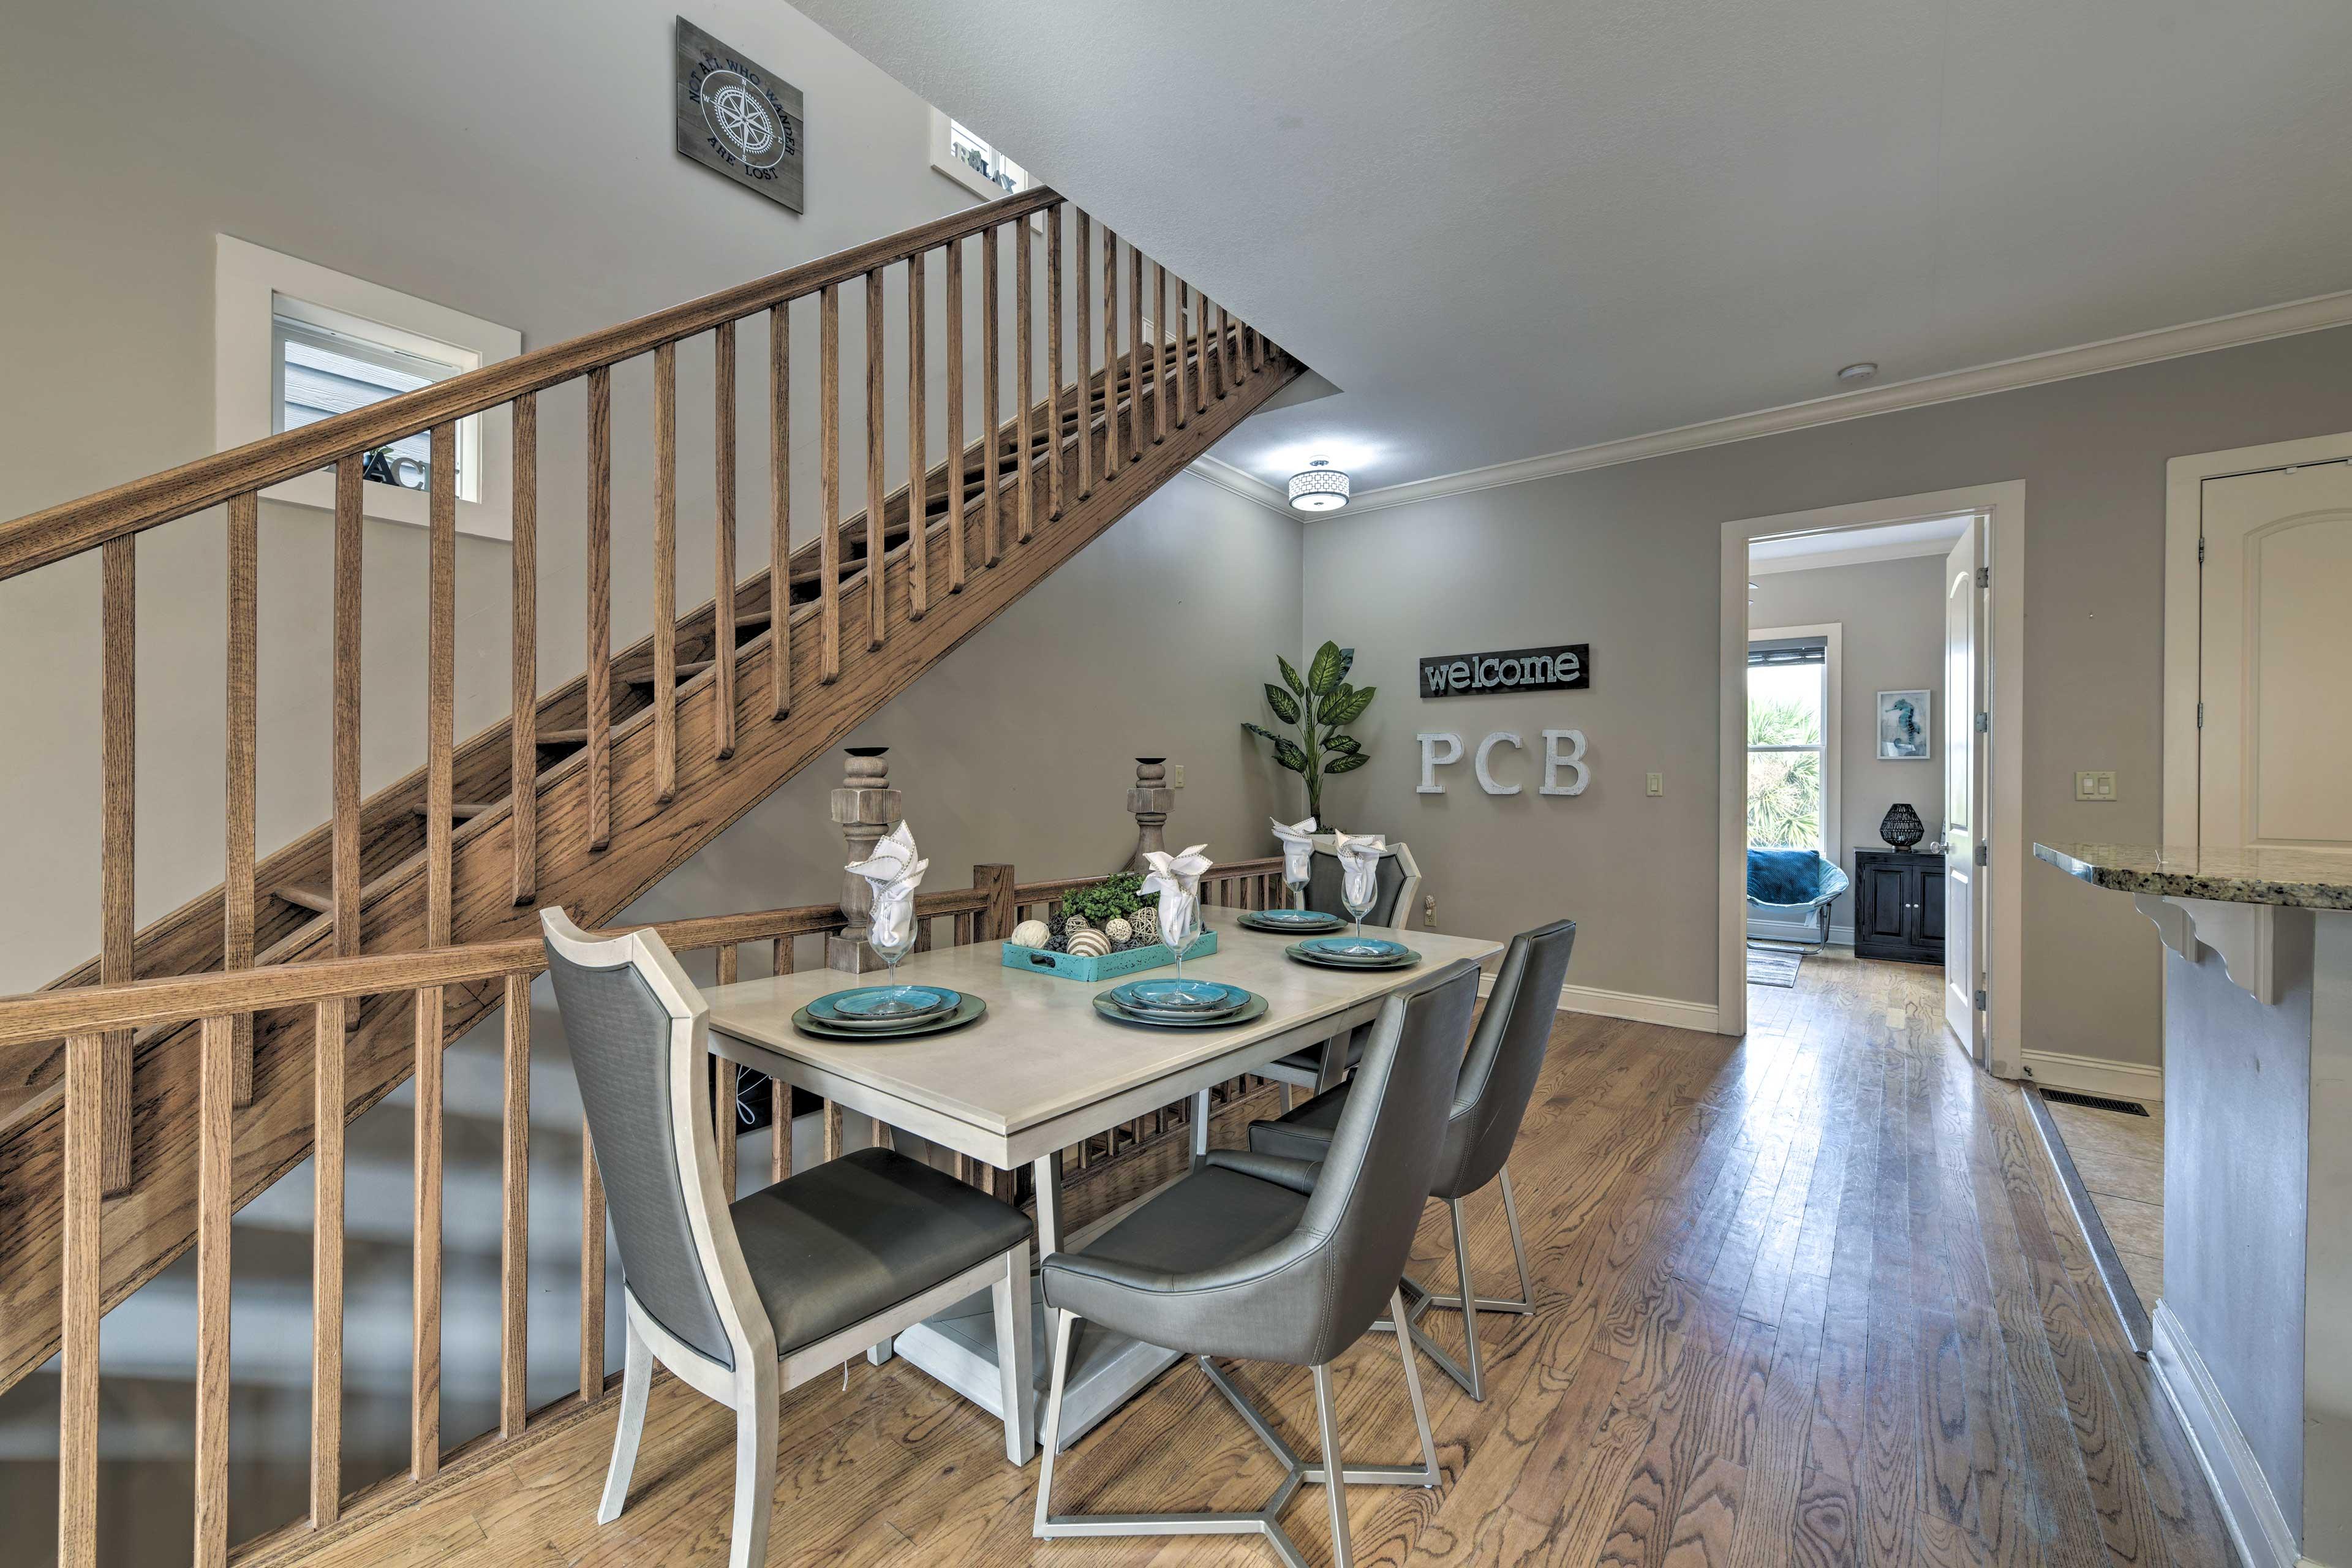 Hardwood floors flow throughout the main level.